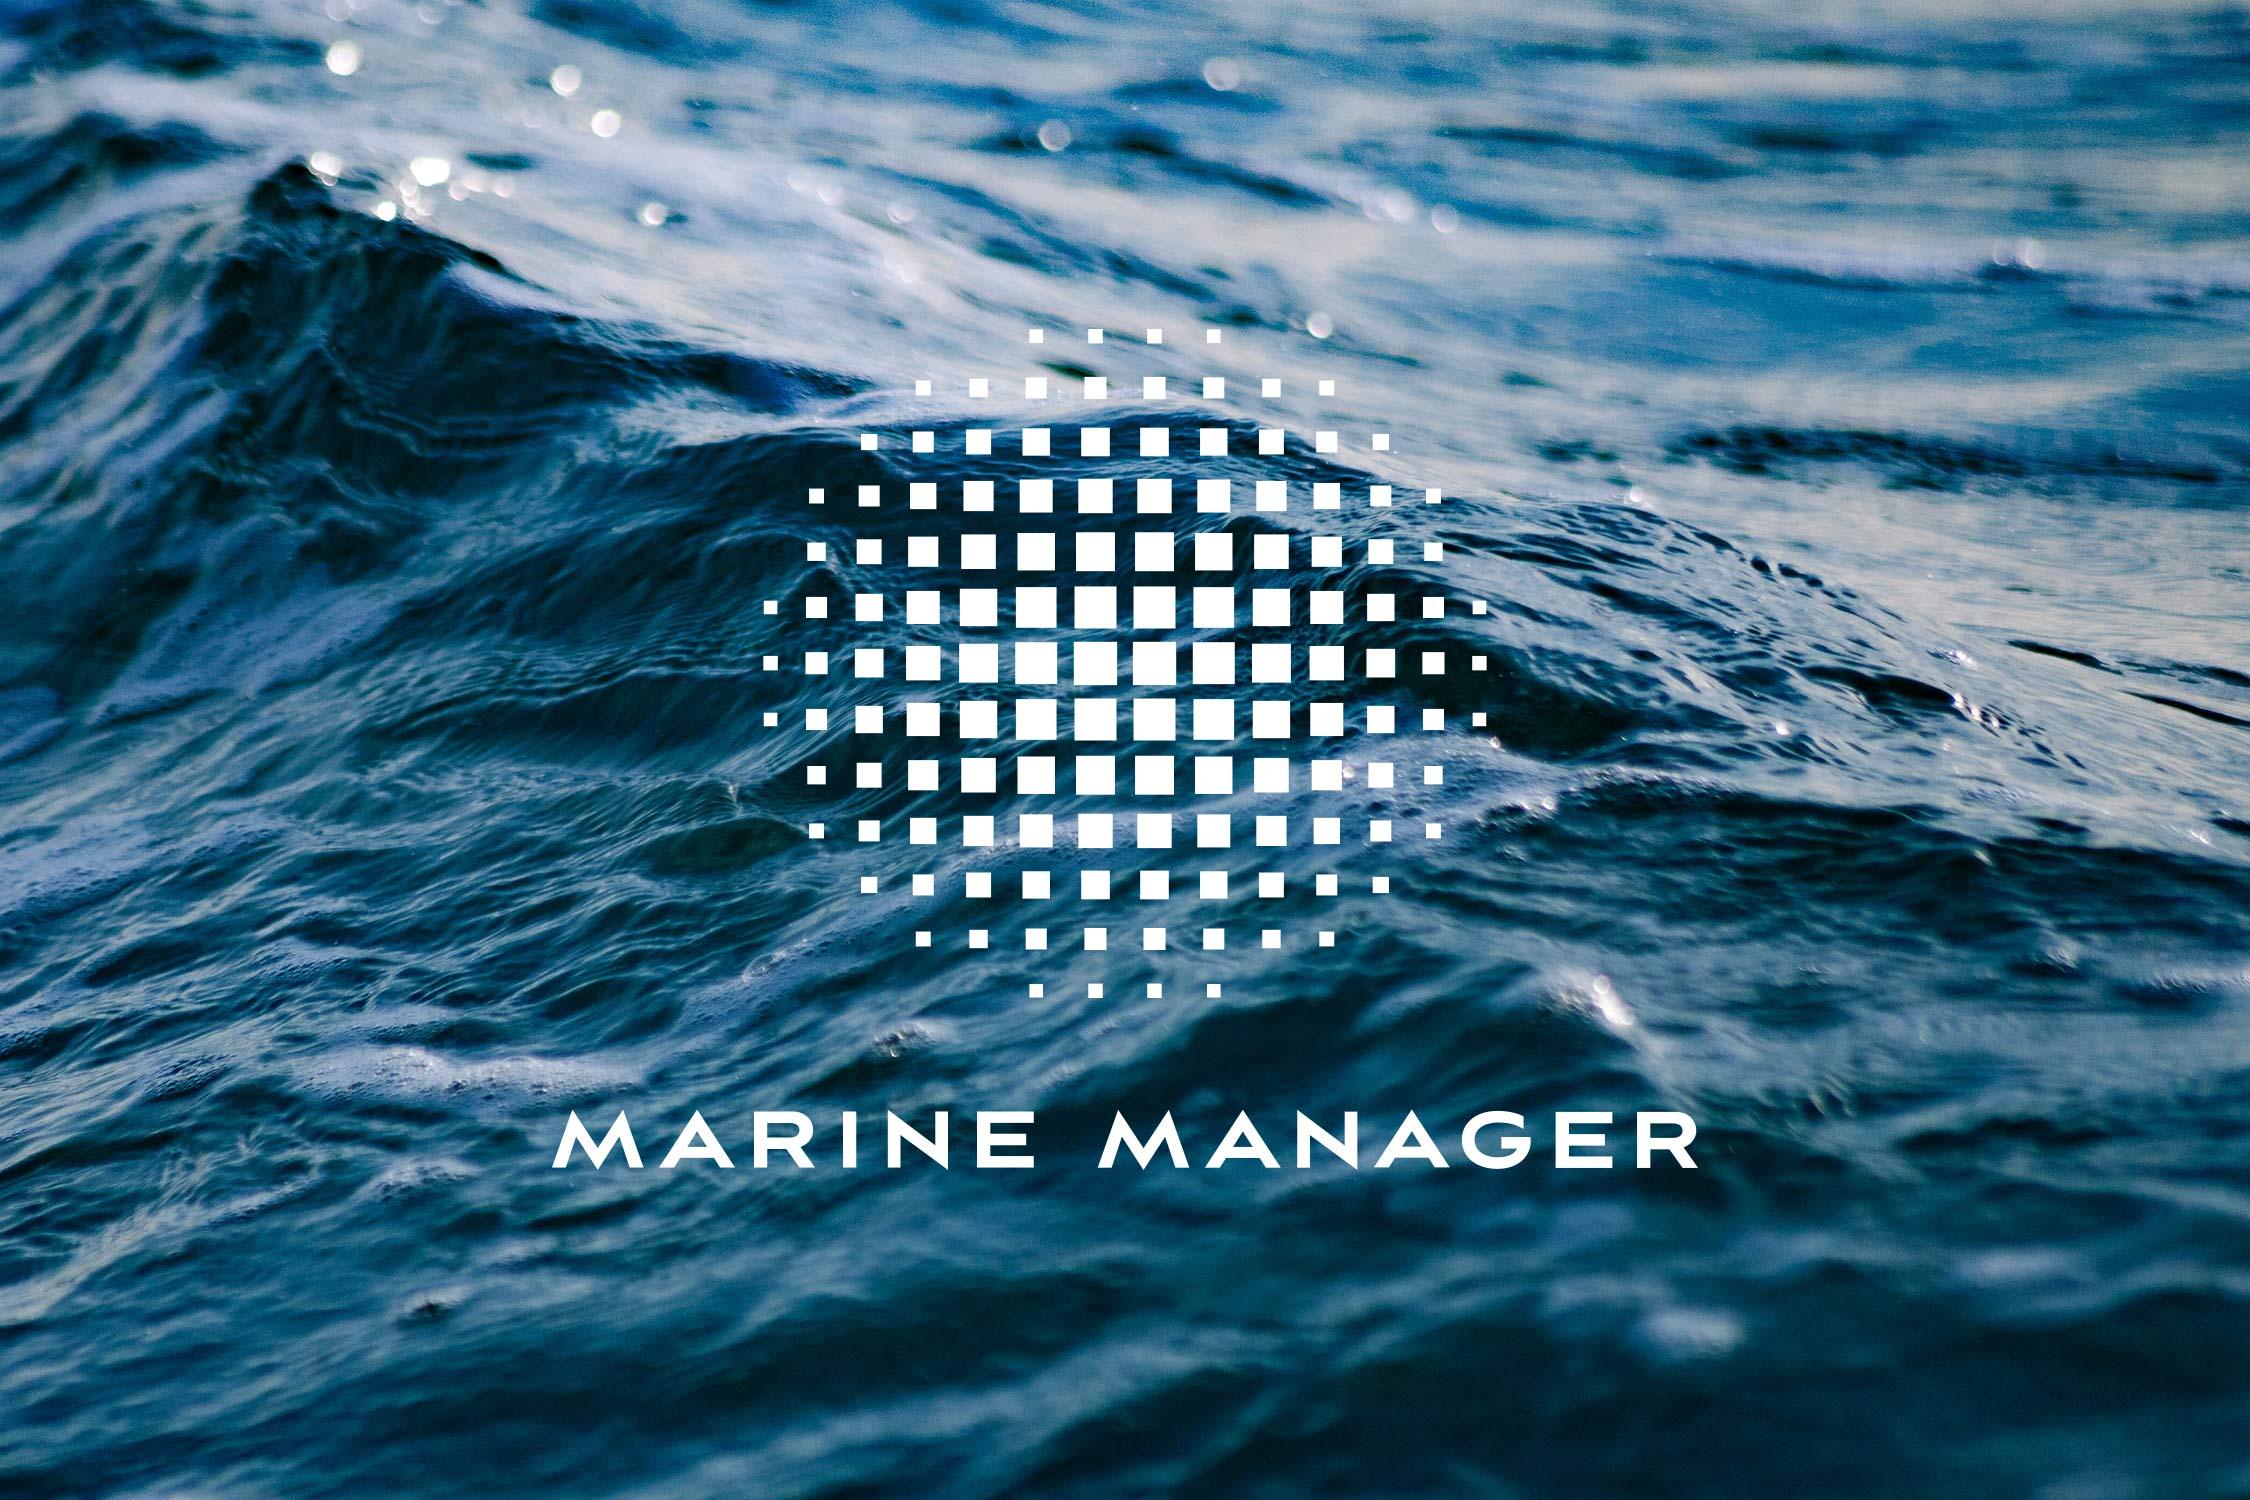 Marine Manager